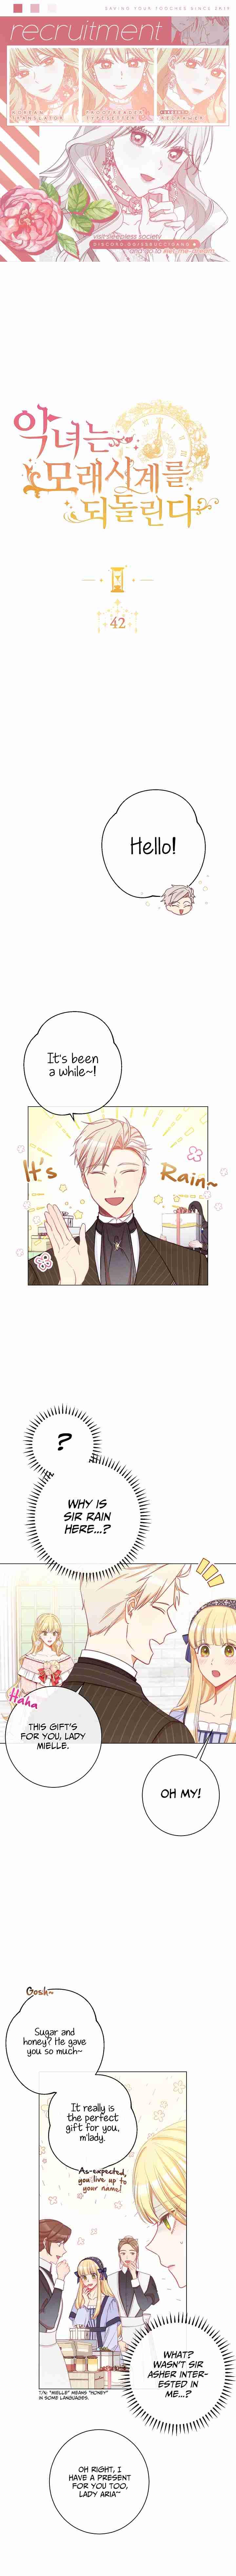 https://manga.mangadogs.com/comics/pic4/51/35315/2113594/d5542ec466d3f3446d5be39e42606a61.jpg Page 1